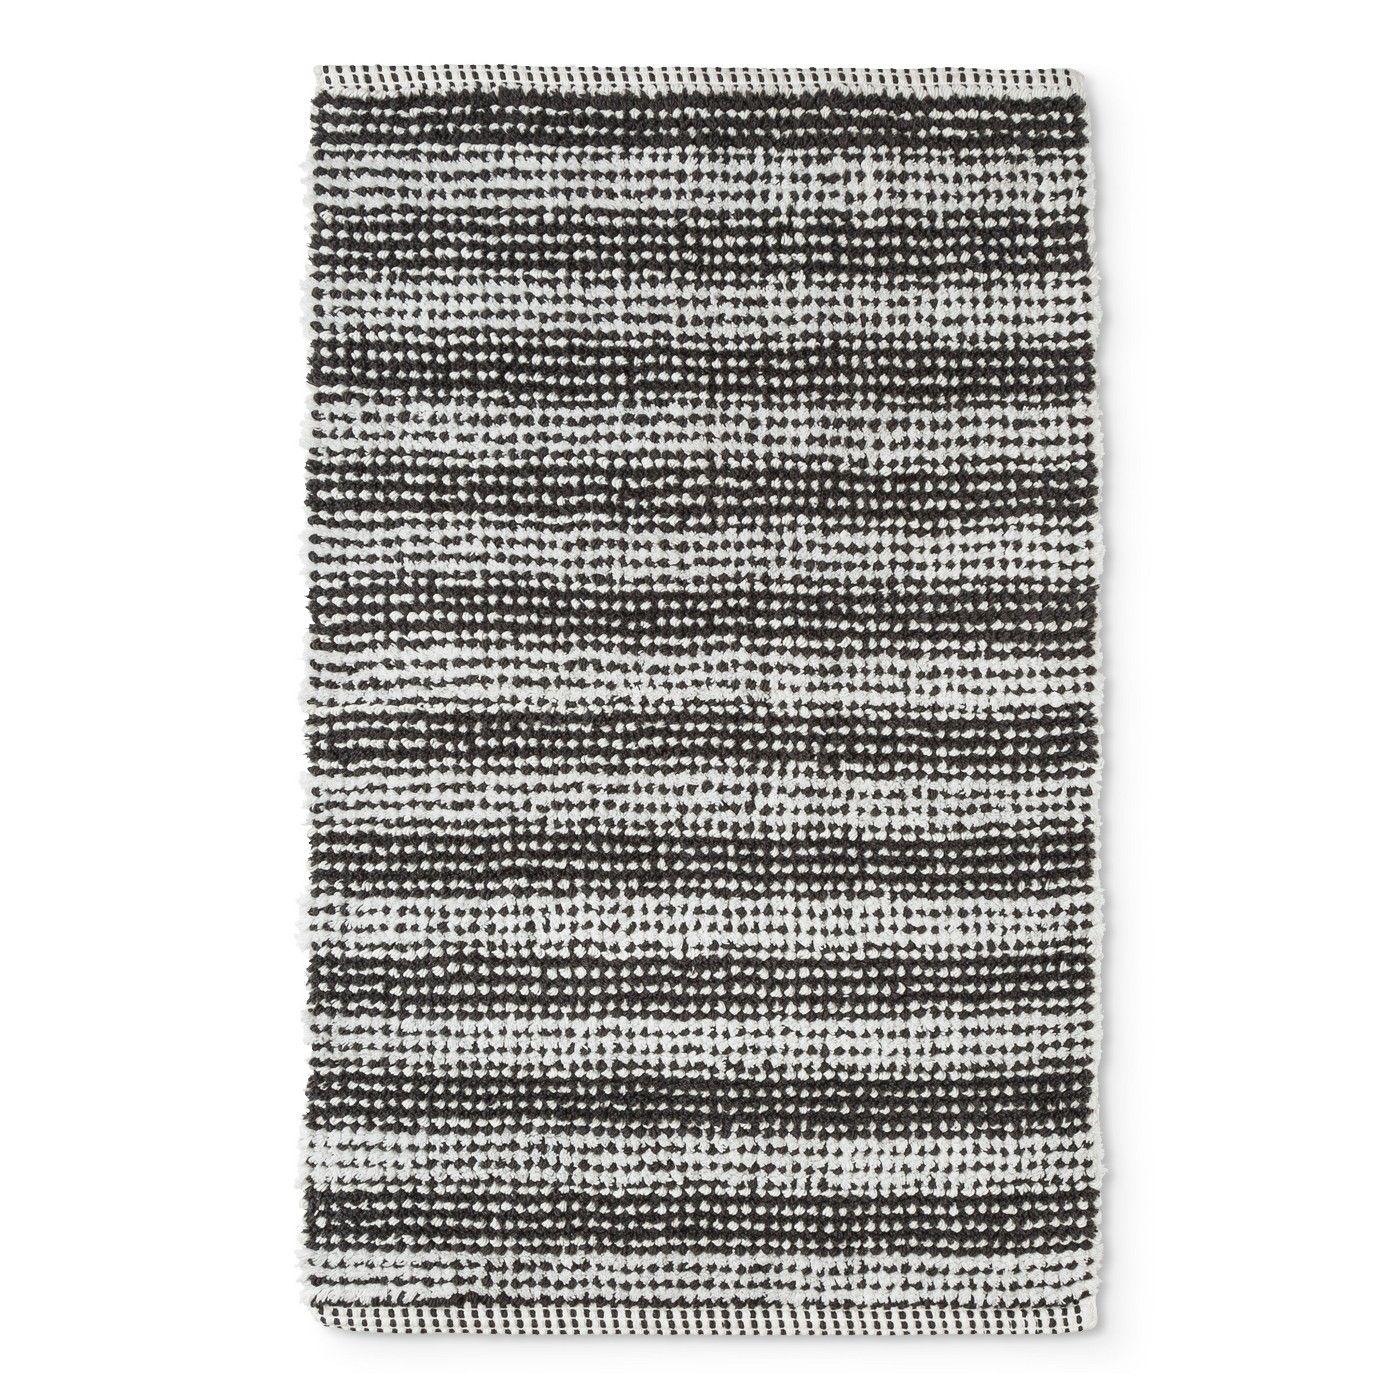 32 X20 Woven Stripe Bath Rug Gray White Project 62 Image 1